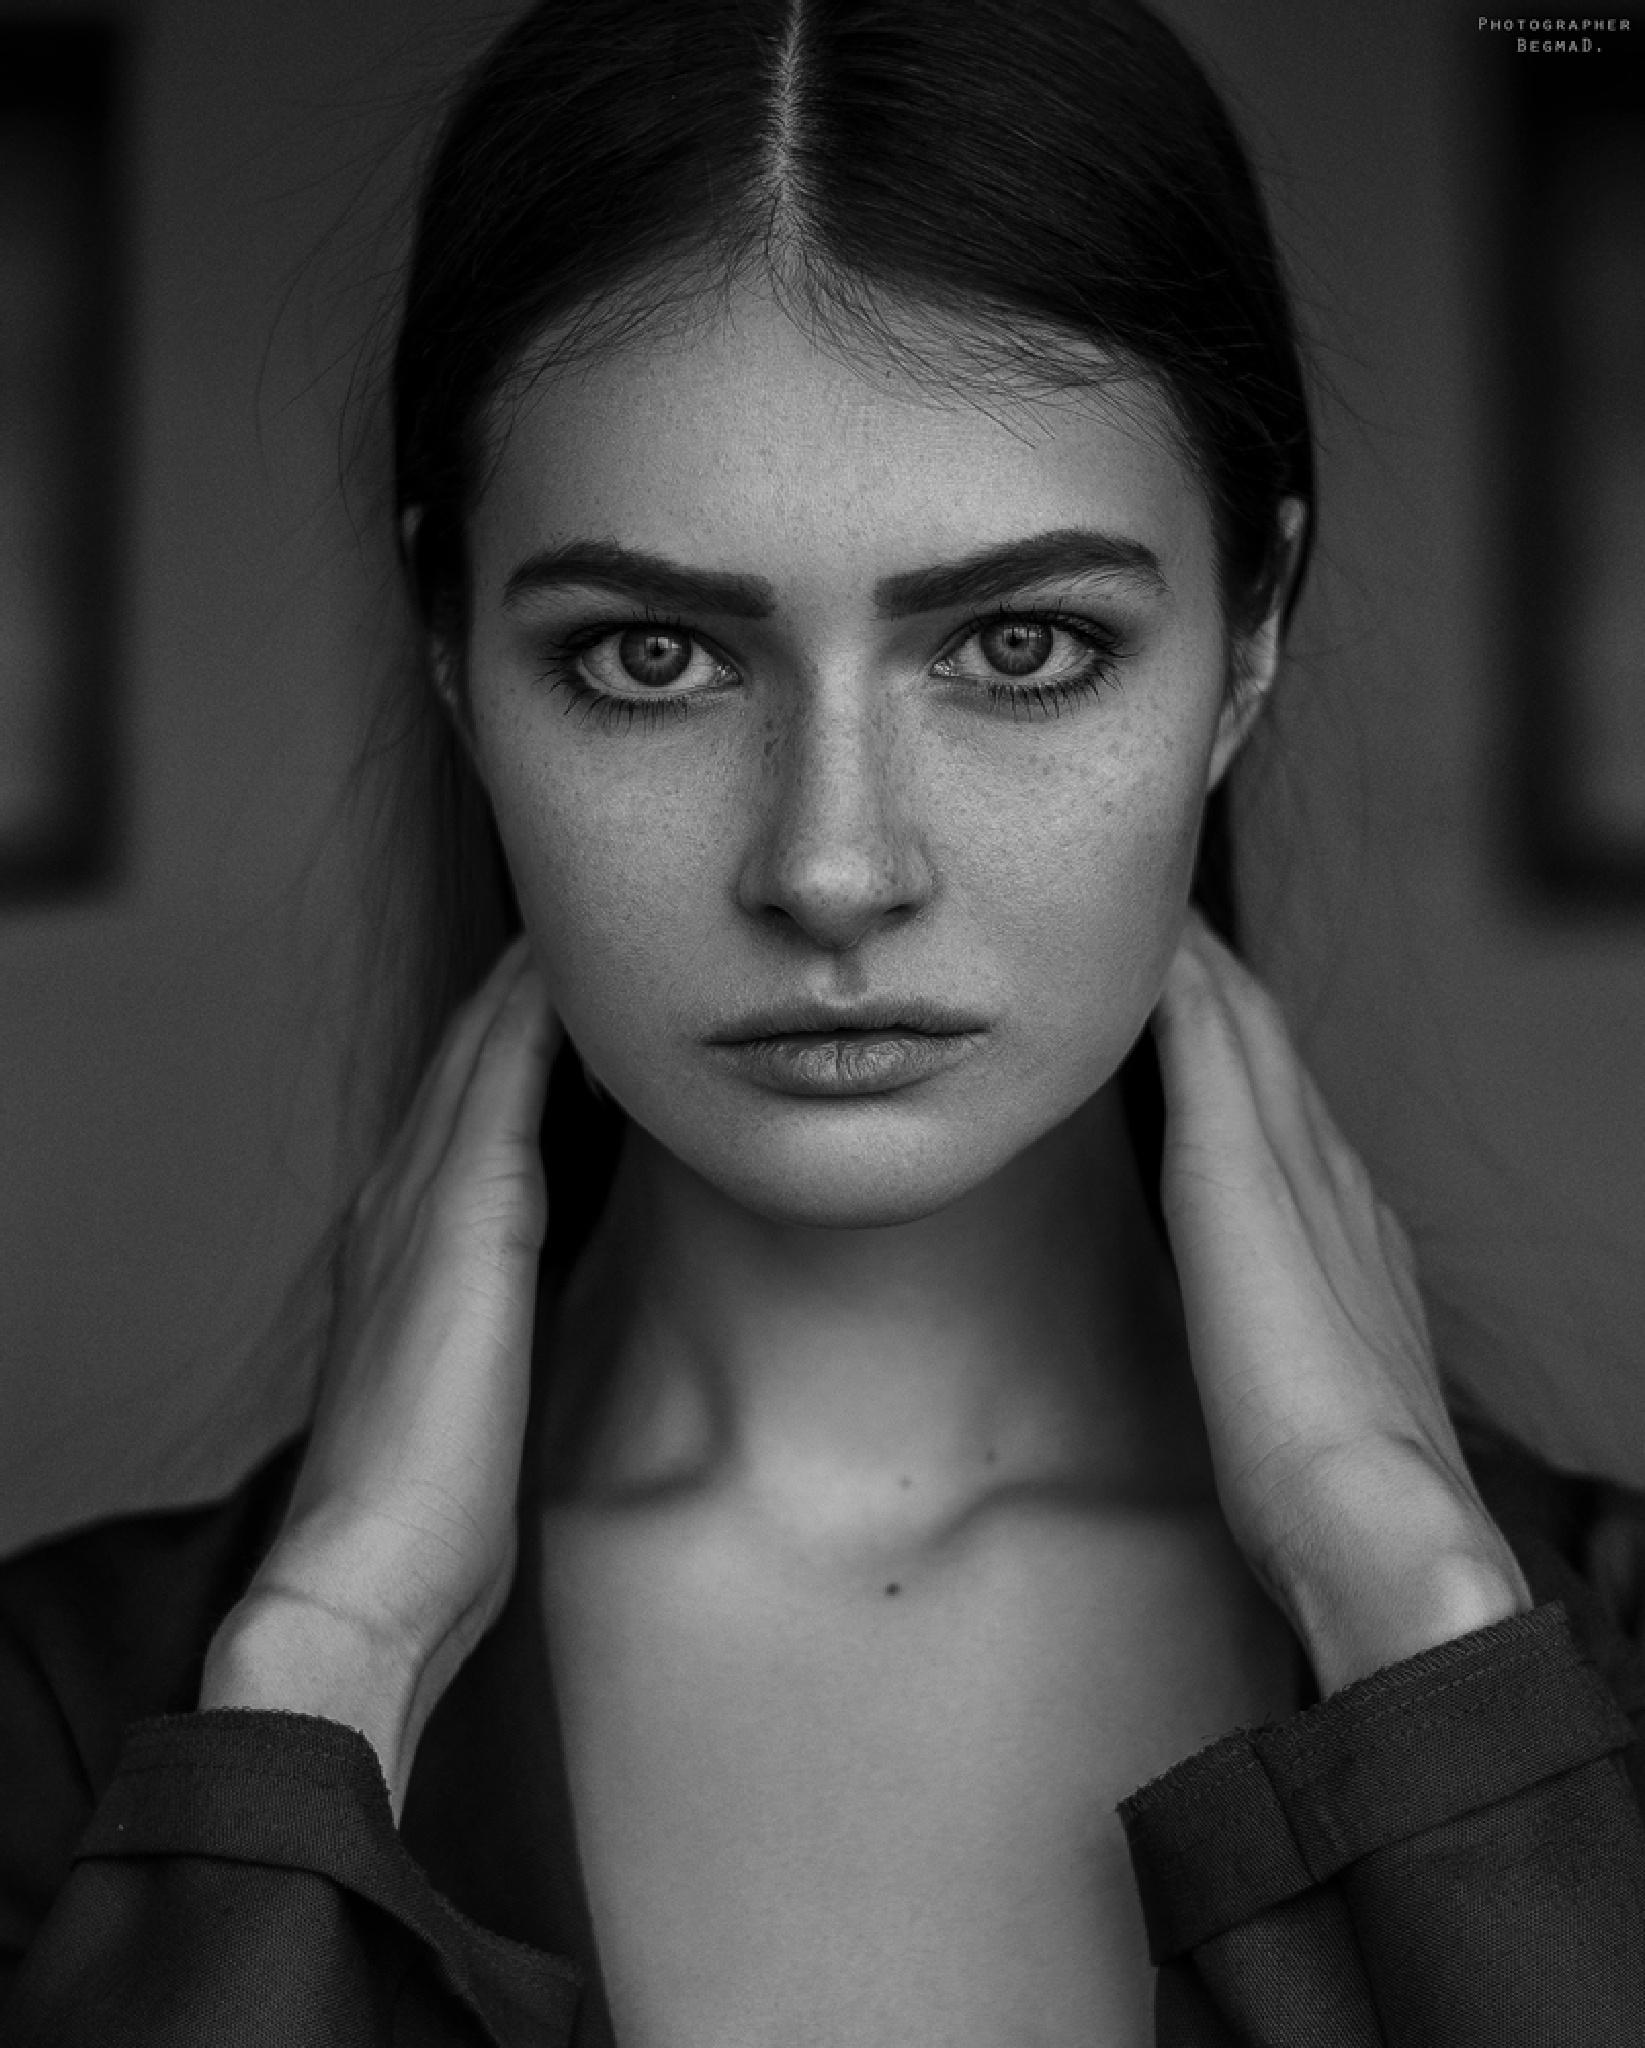 Maria by Dima Begma (Дмитрий Бегма)